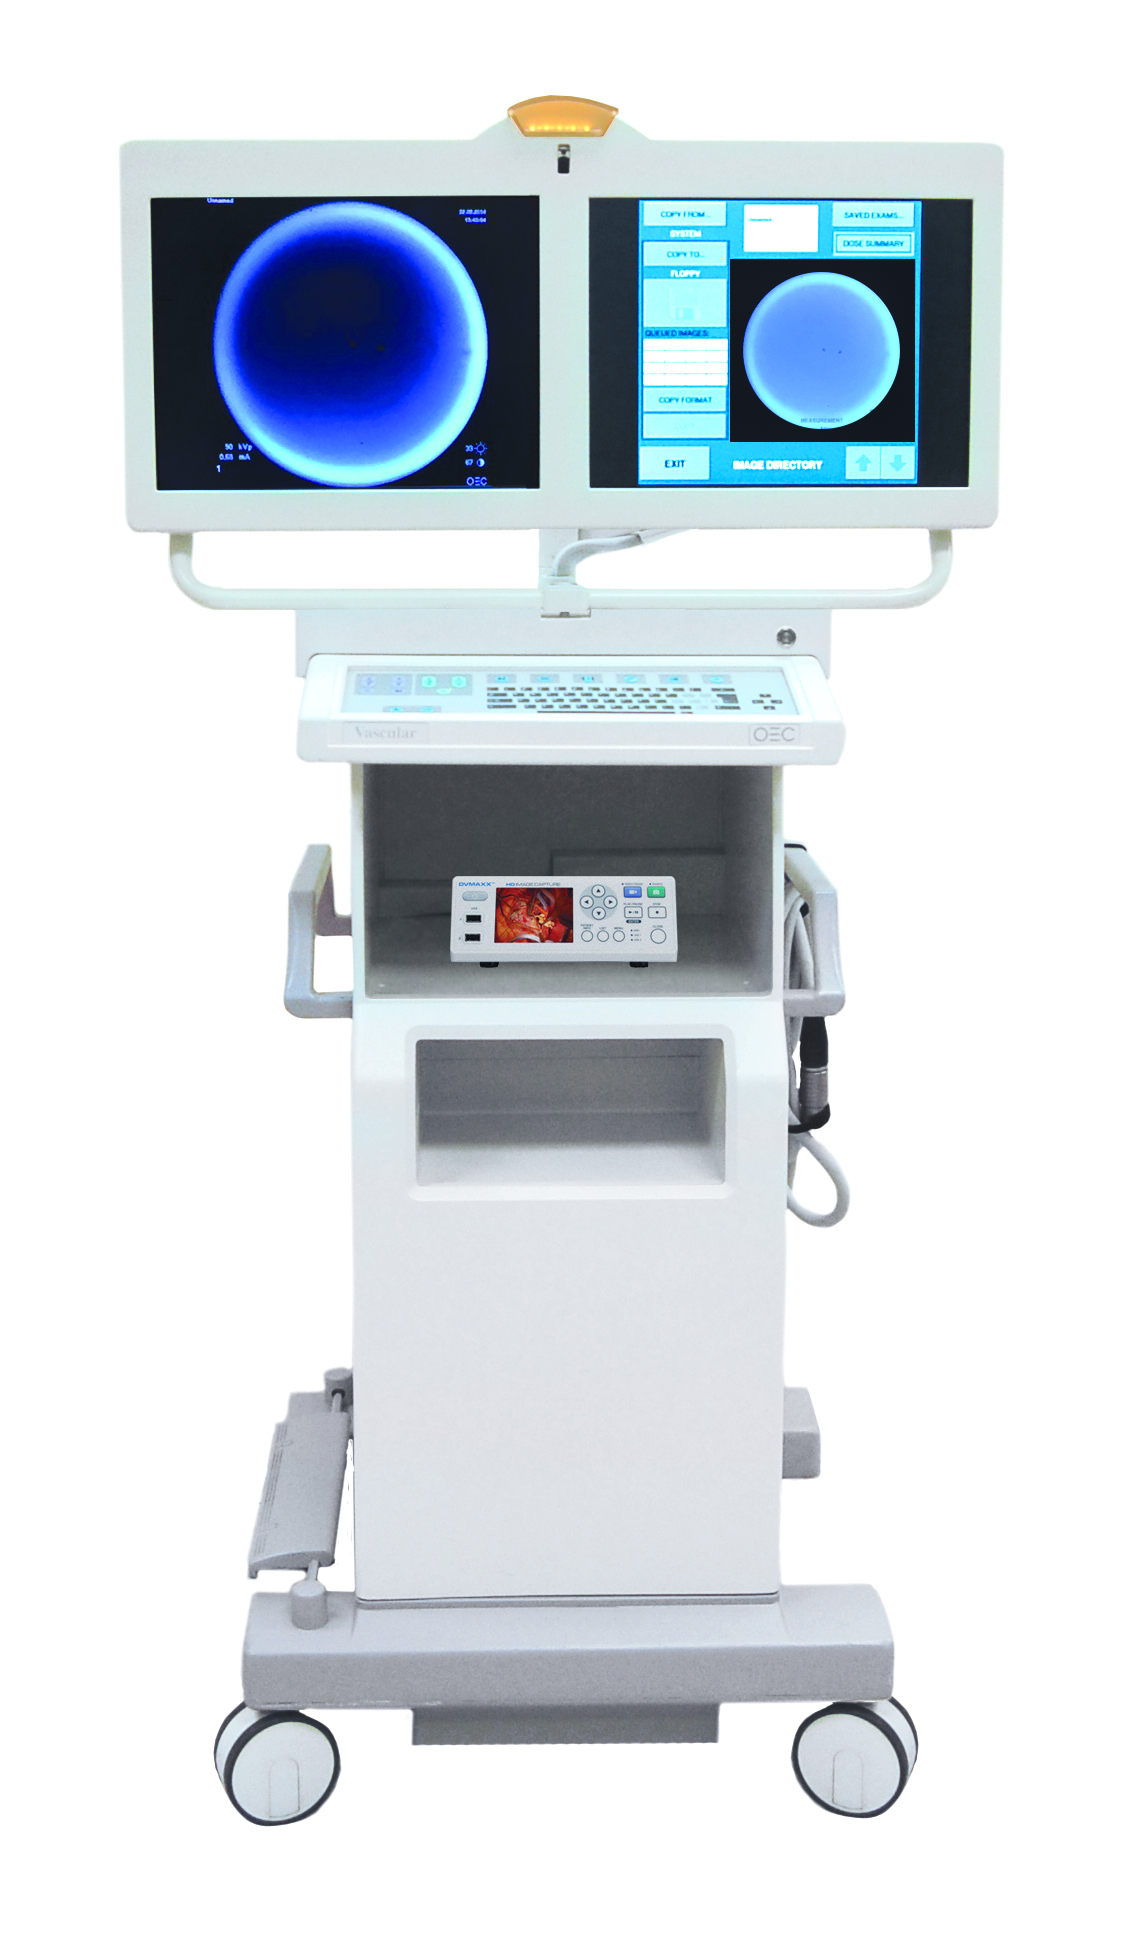 Ampronix Announces Availability Of New Oec 9800 Retrofit